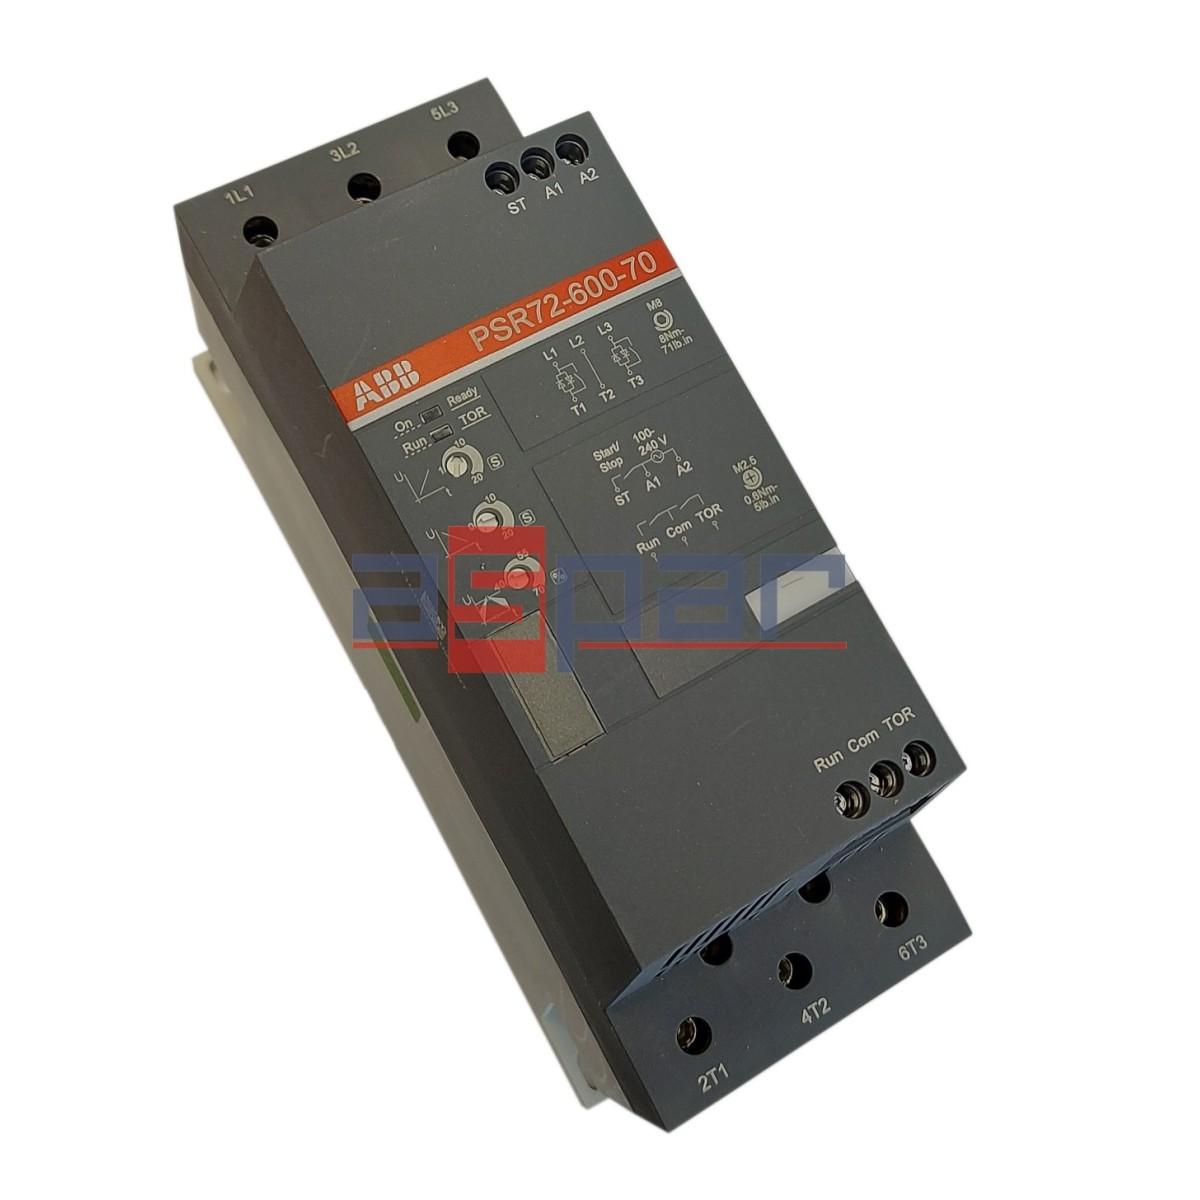 Softstart 37kW, PSR72-600-70, 1SFA896113R7000